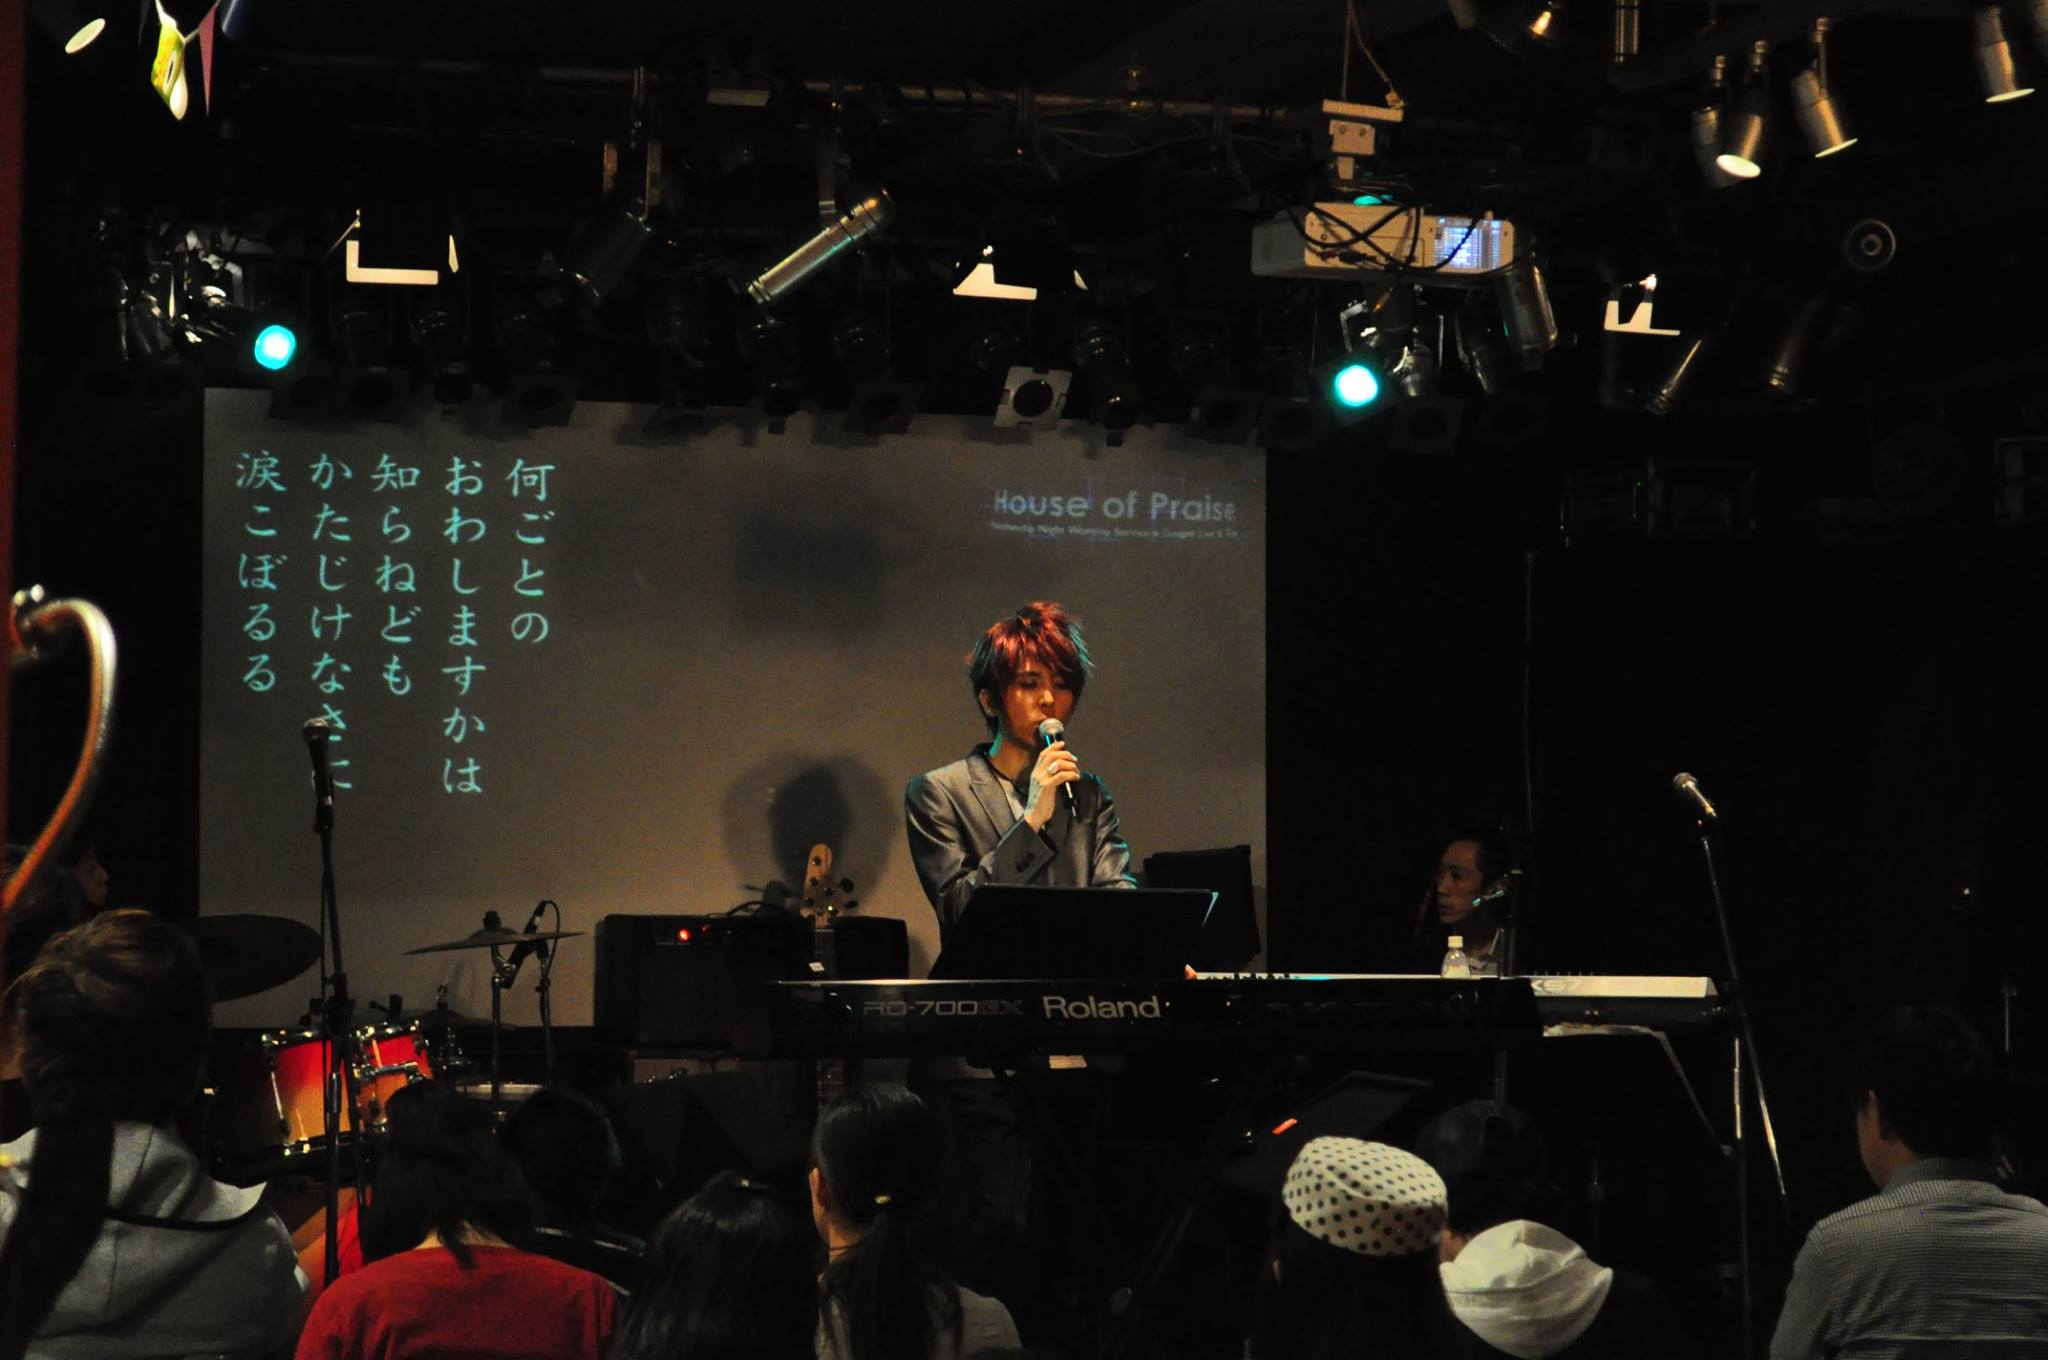 http://www.kickbackcafe.jp/support2/report/13173057_1035403933173814_3313488357552910146_o.jpg